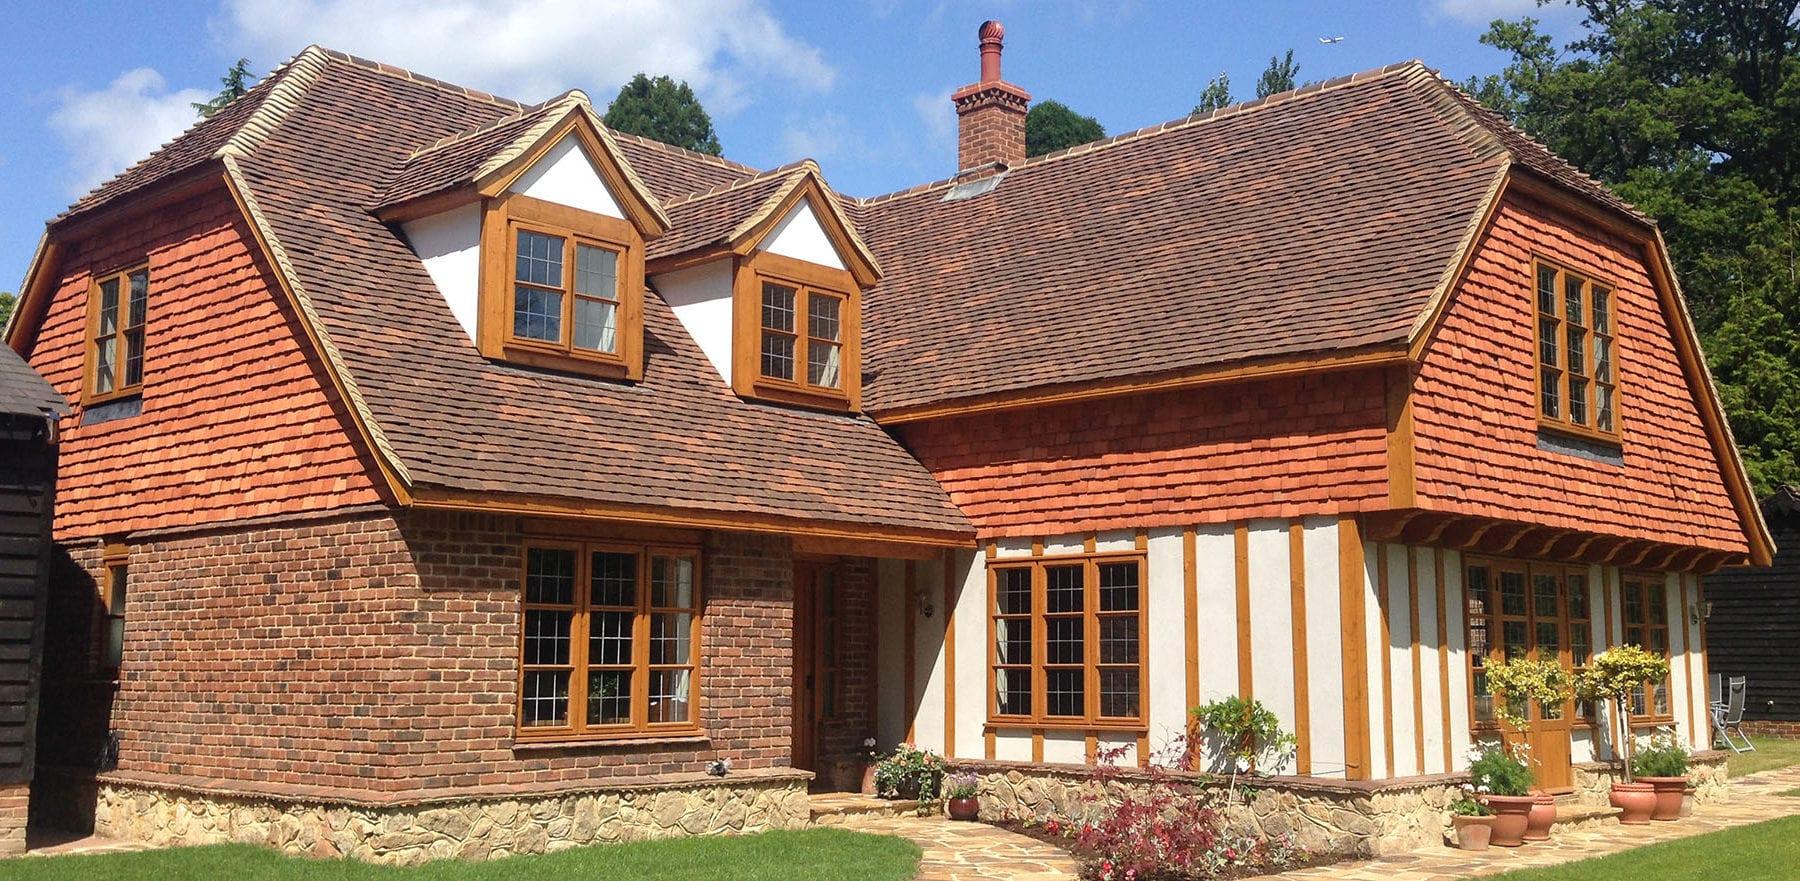 Lifestiles - Handmade Bespoke Clay Roof Tiles - Rotherfield, England